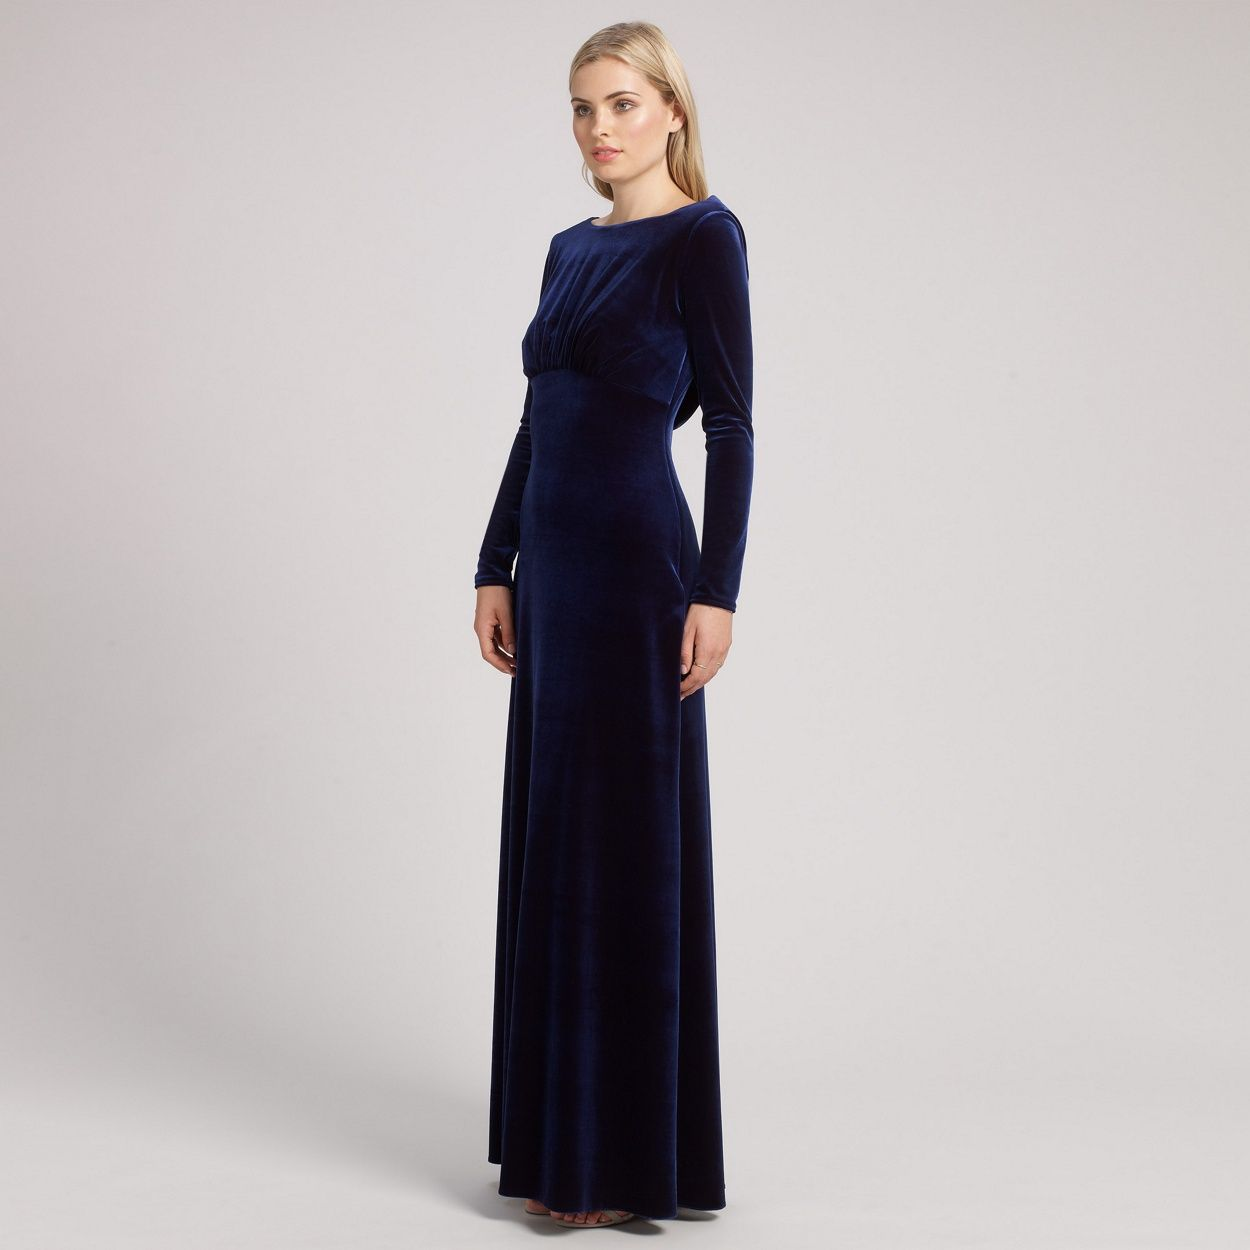 Ariella london navy rafaella long sleeve velvet dress at debenhams